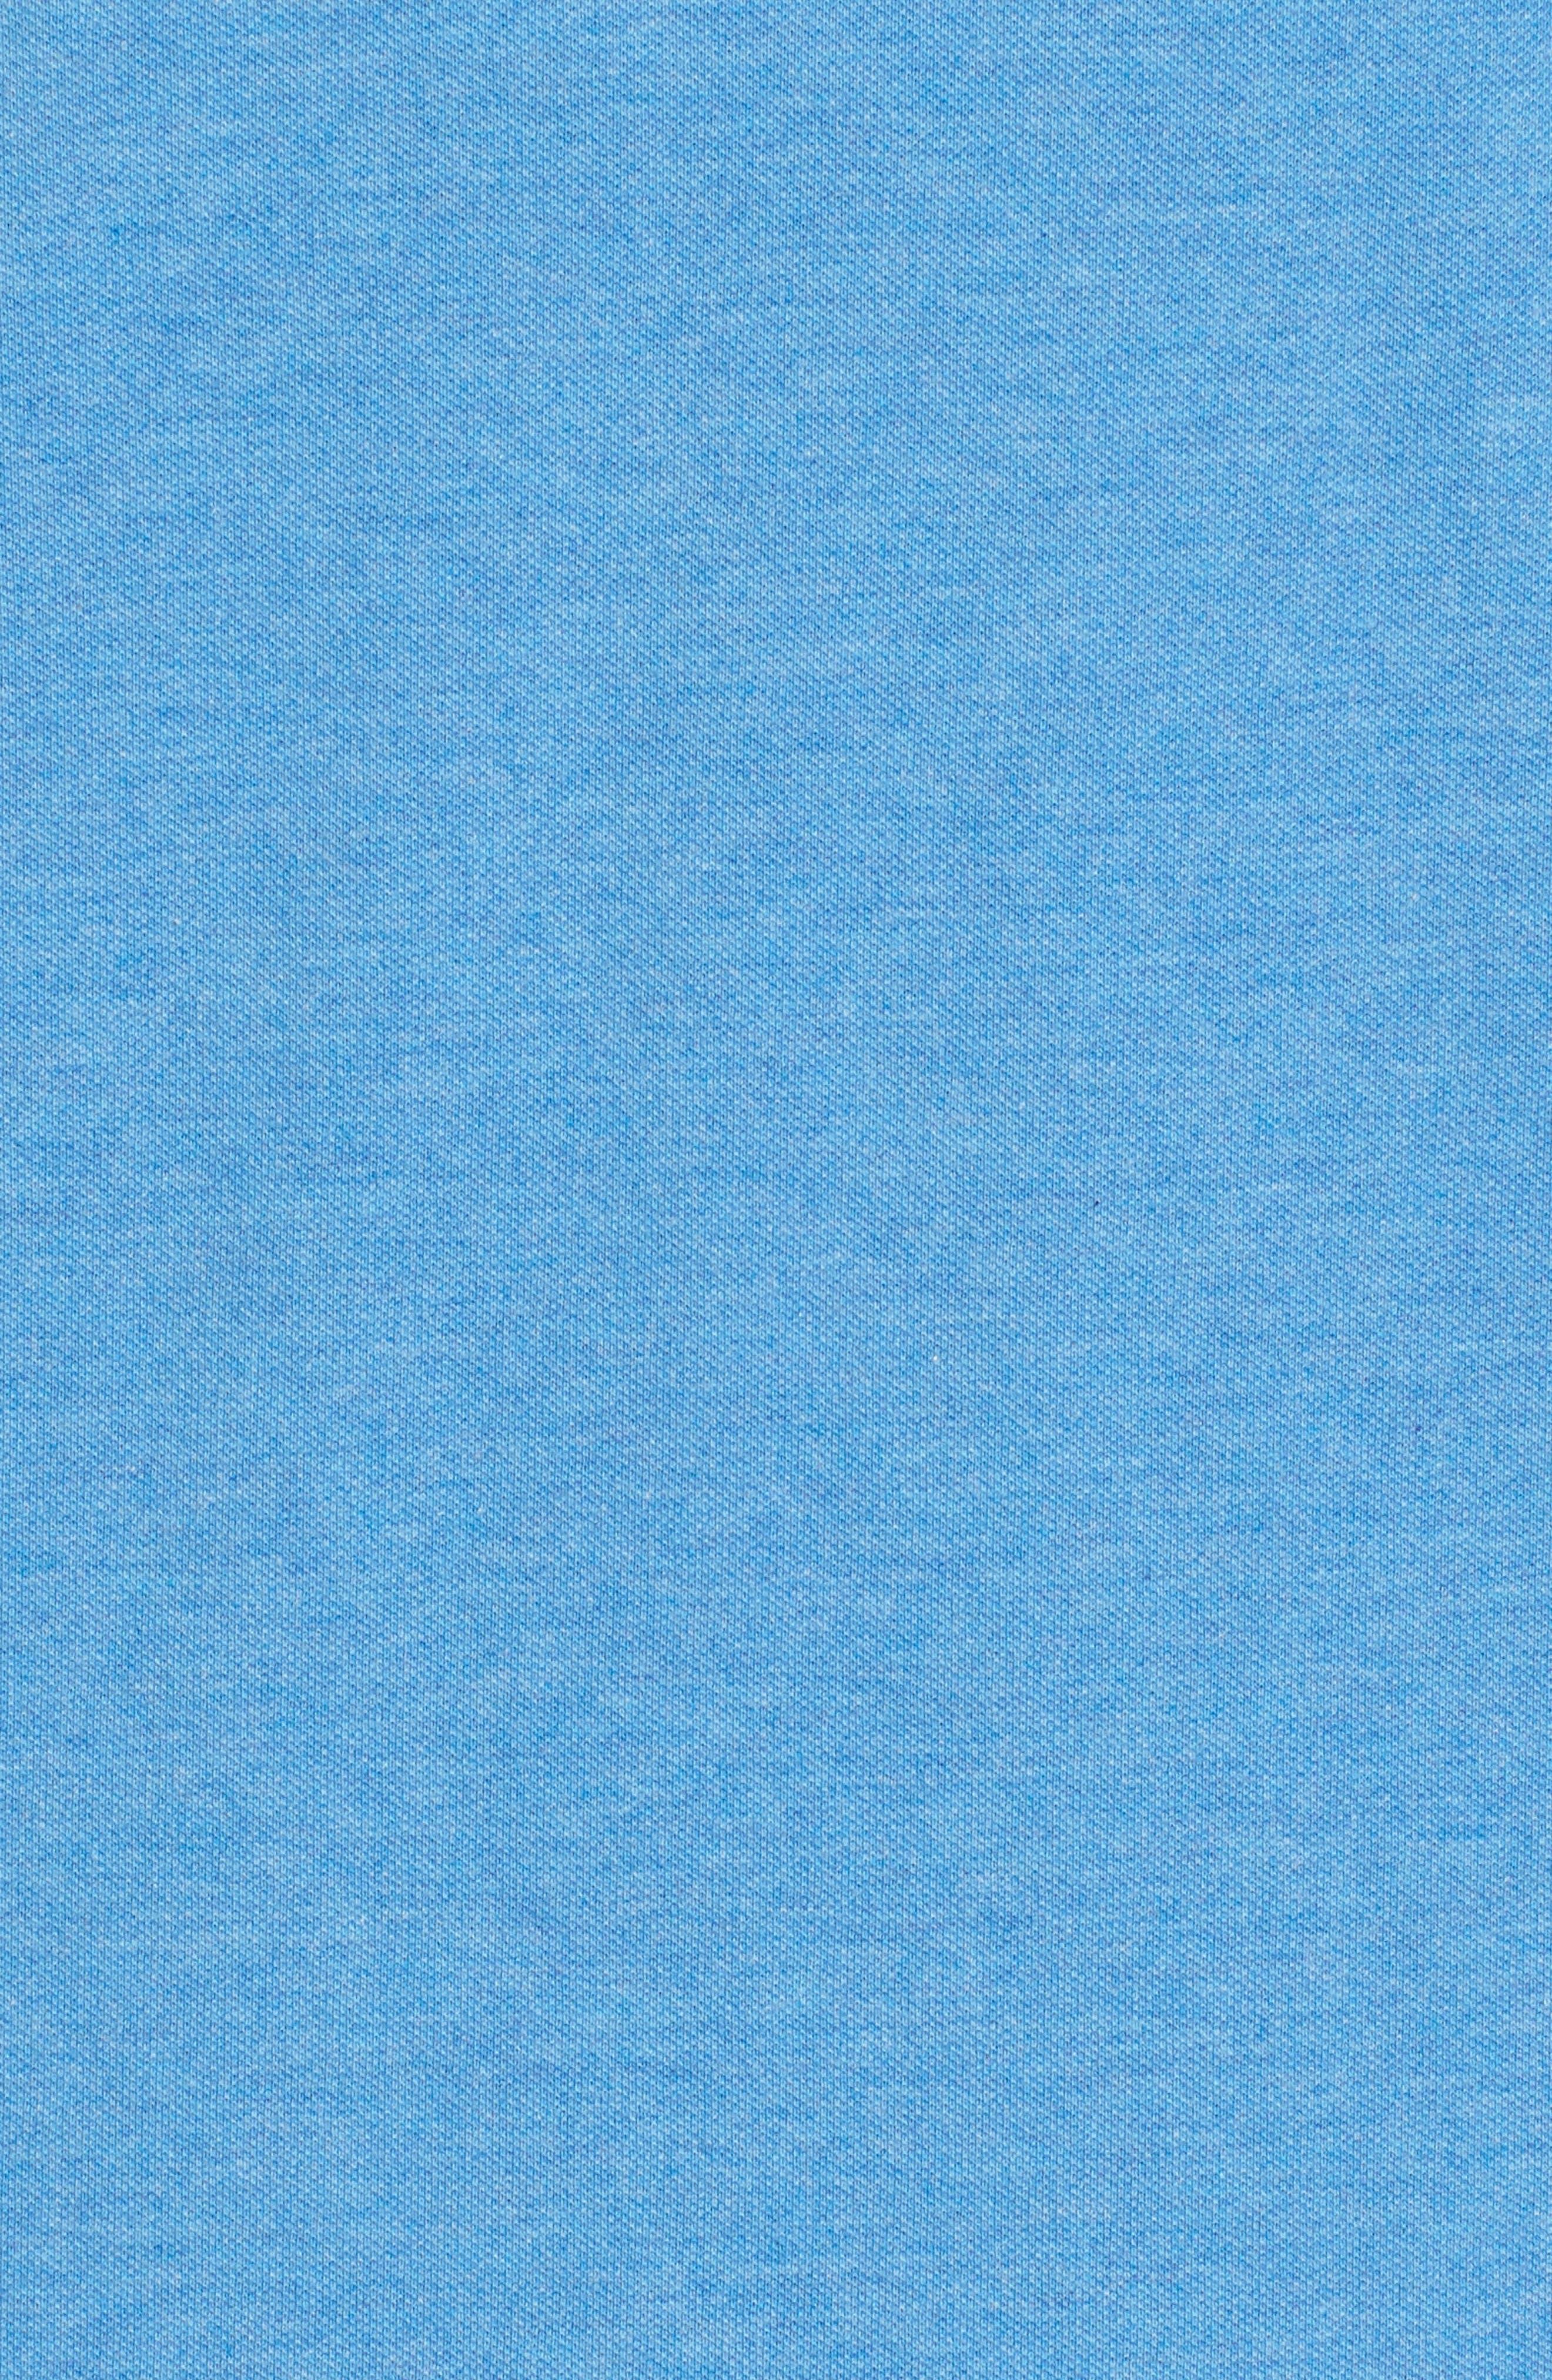 Regular Fit Piqué Polo,                             Alternate thumbnail 5, color,                             DOCKSIDE BLUE